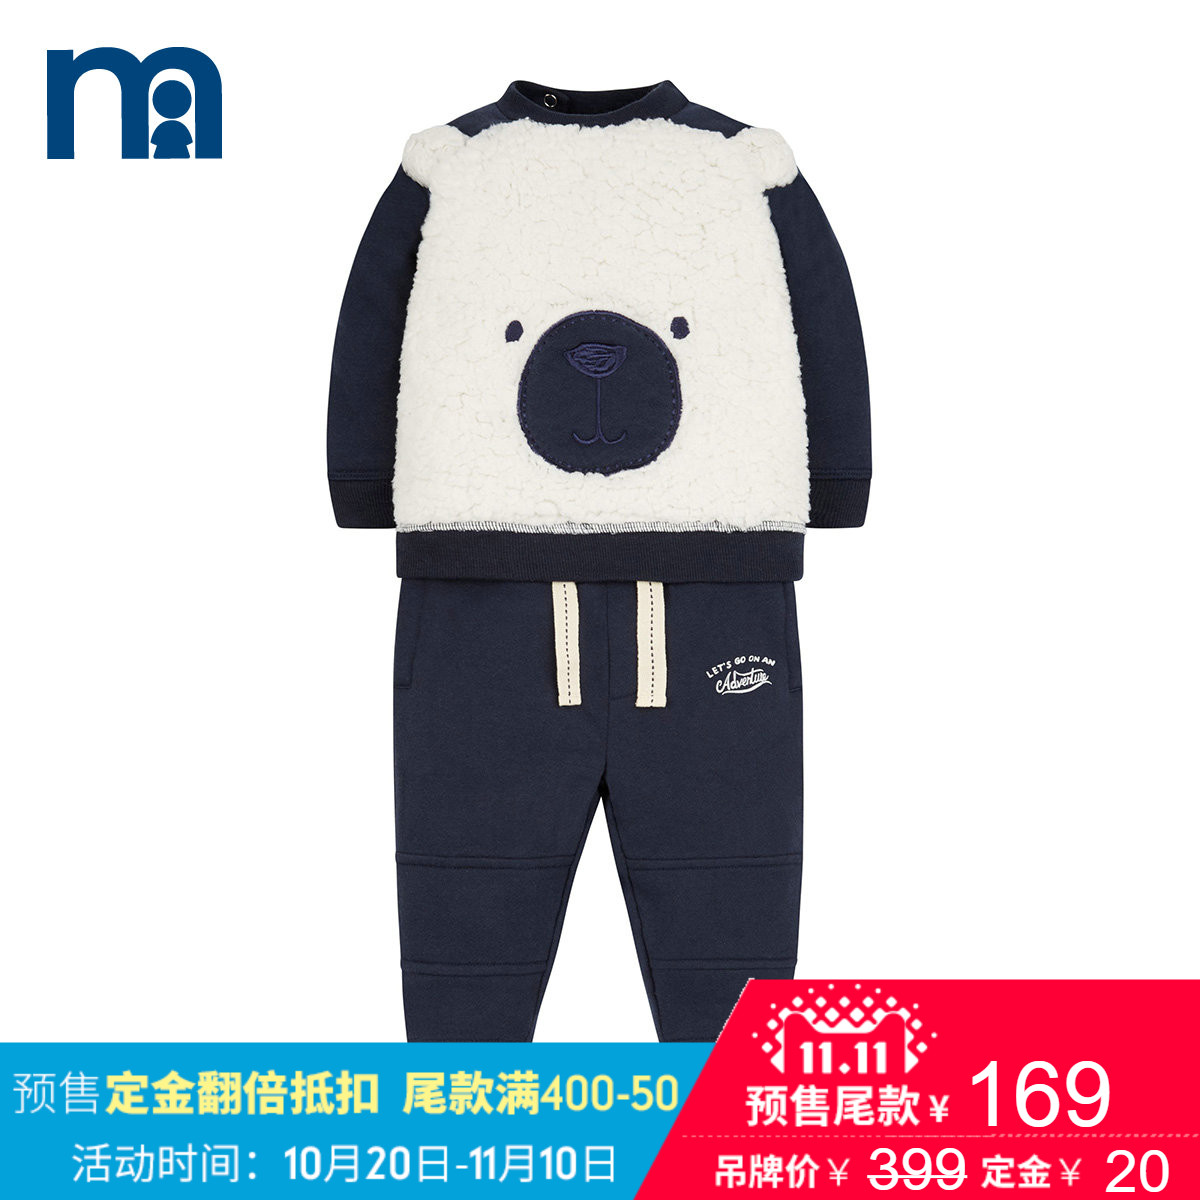 mothercare英国男婴儿套装秋装宝宝卡通T恤运动长裤1-3岁中小童装